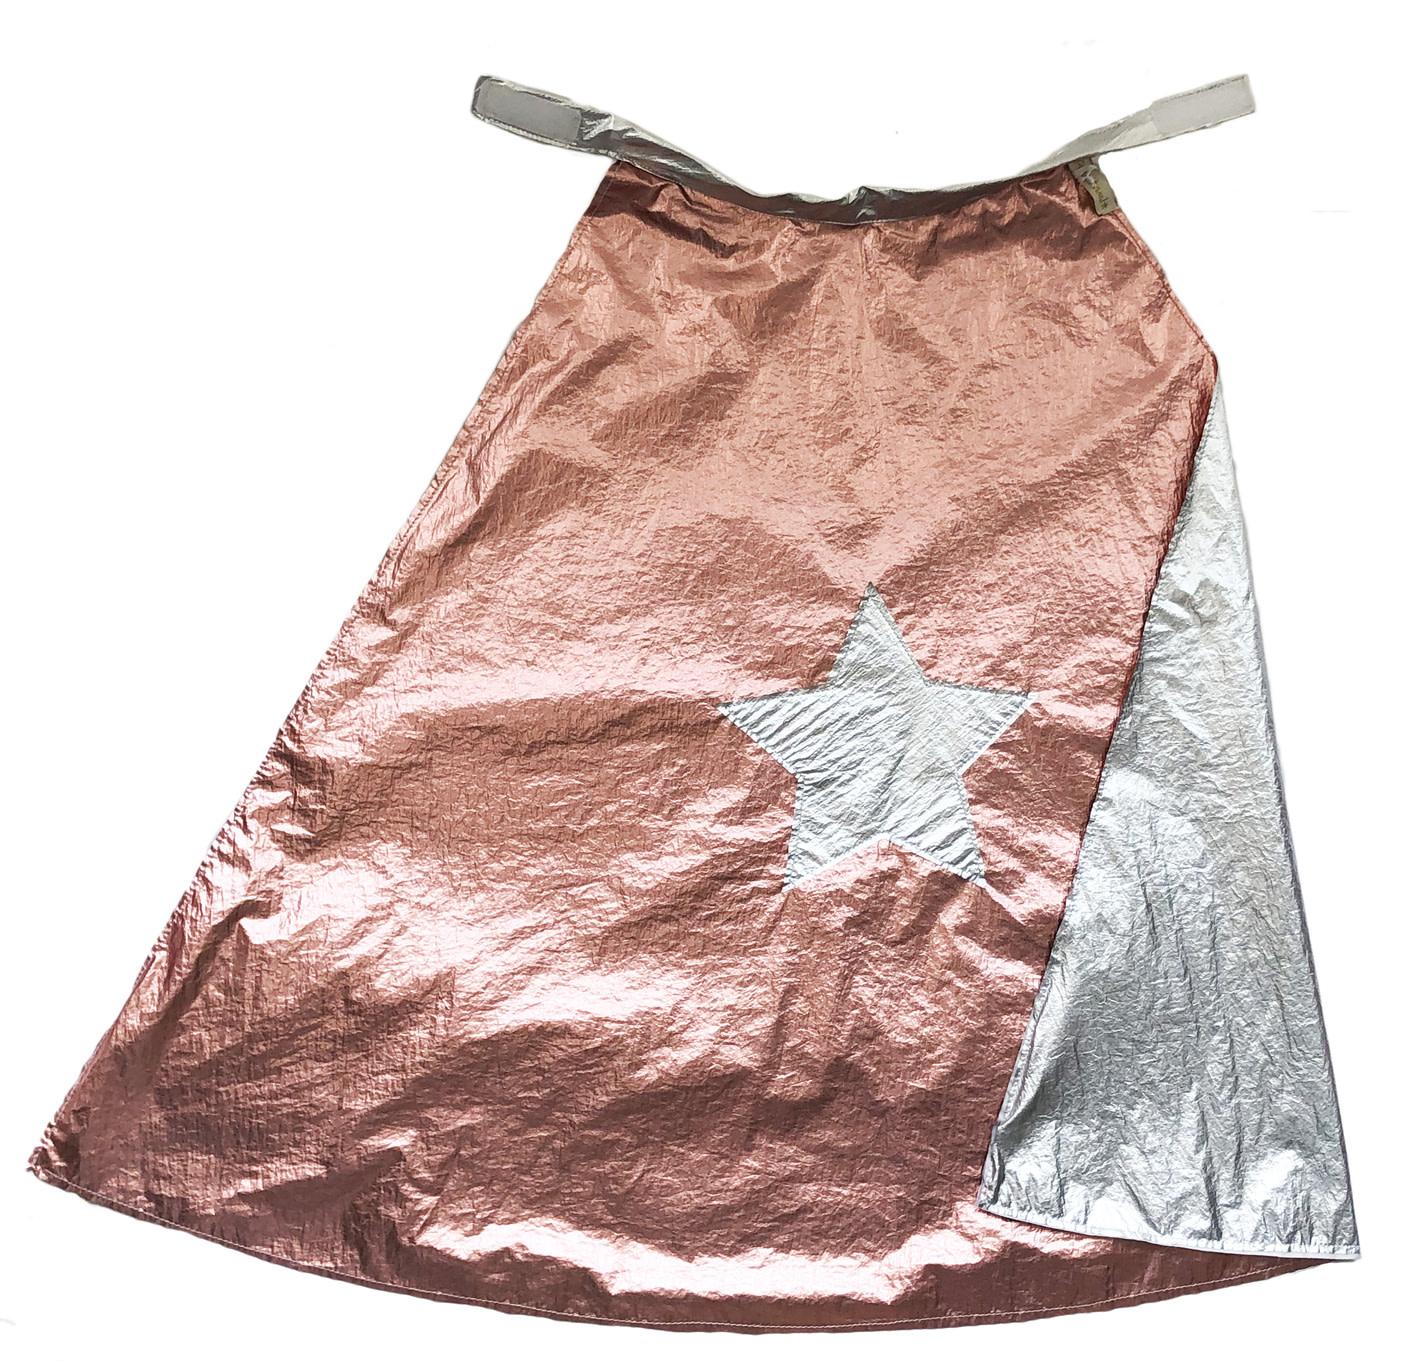 RATATAM hero cape pink silver 1 size